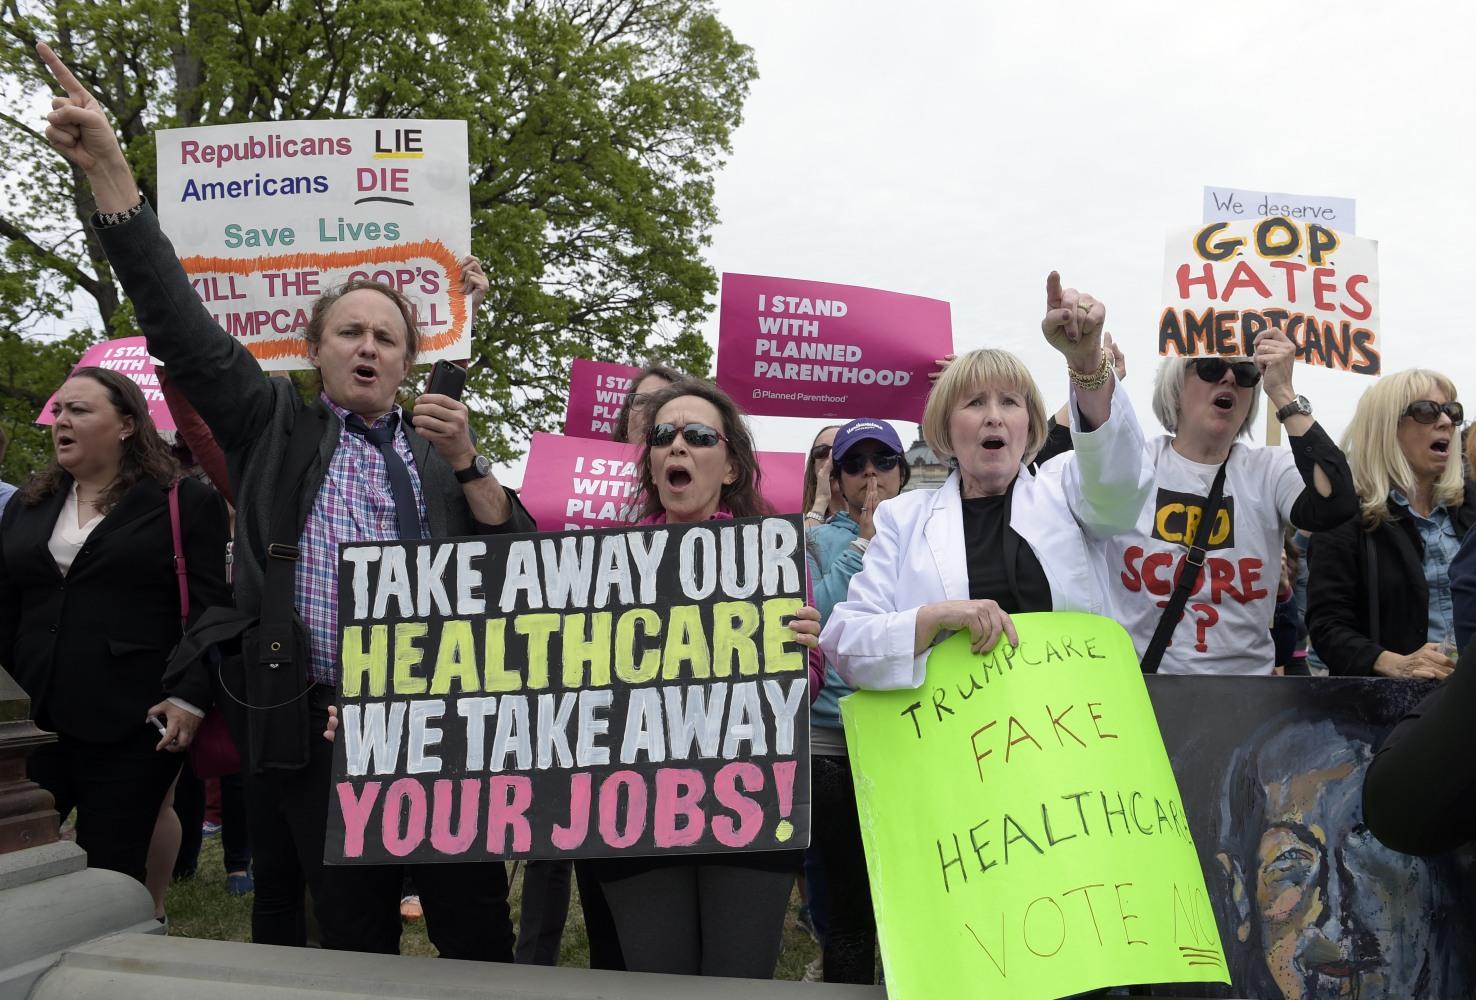 Rand Paul: Healthcare Tweet 'Poking the Bear' at Senate Leaders